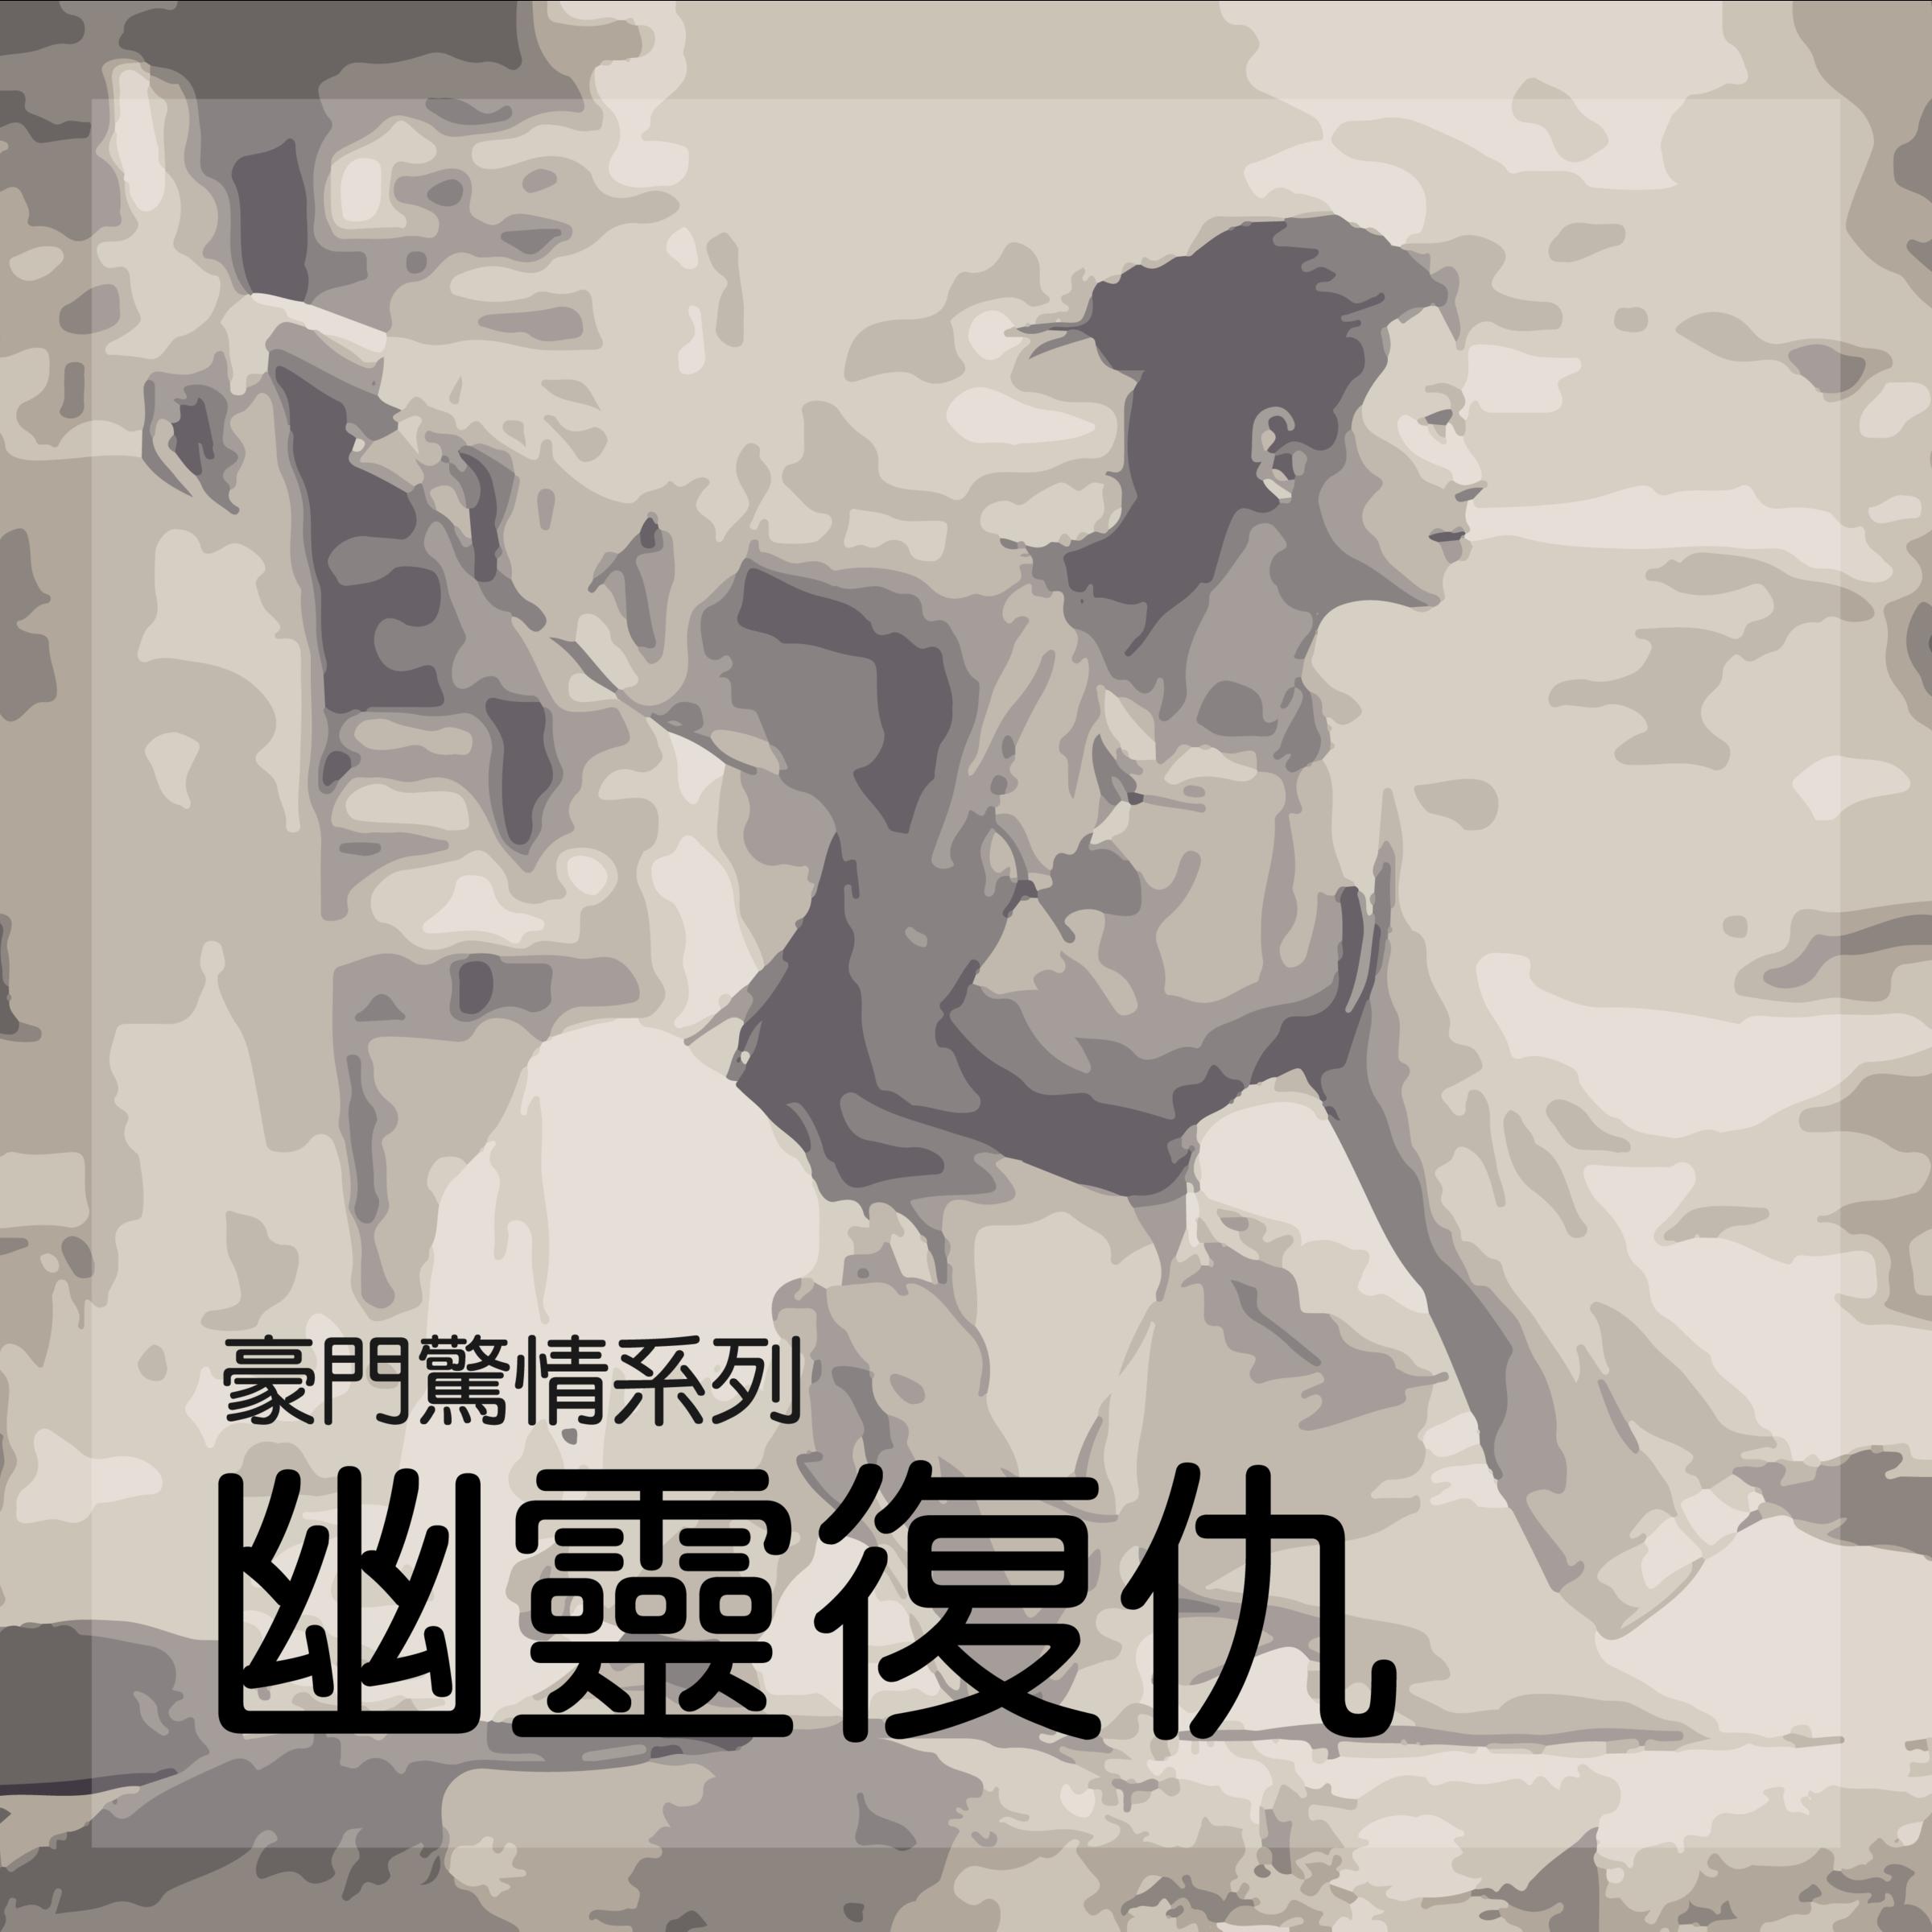 幽靈復仇-01.png